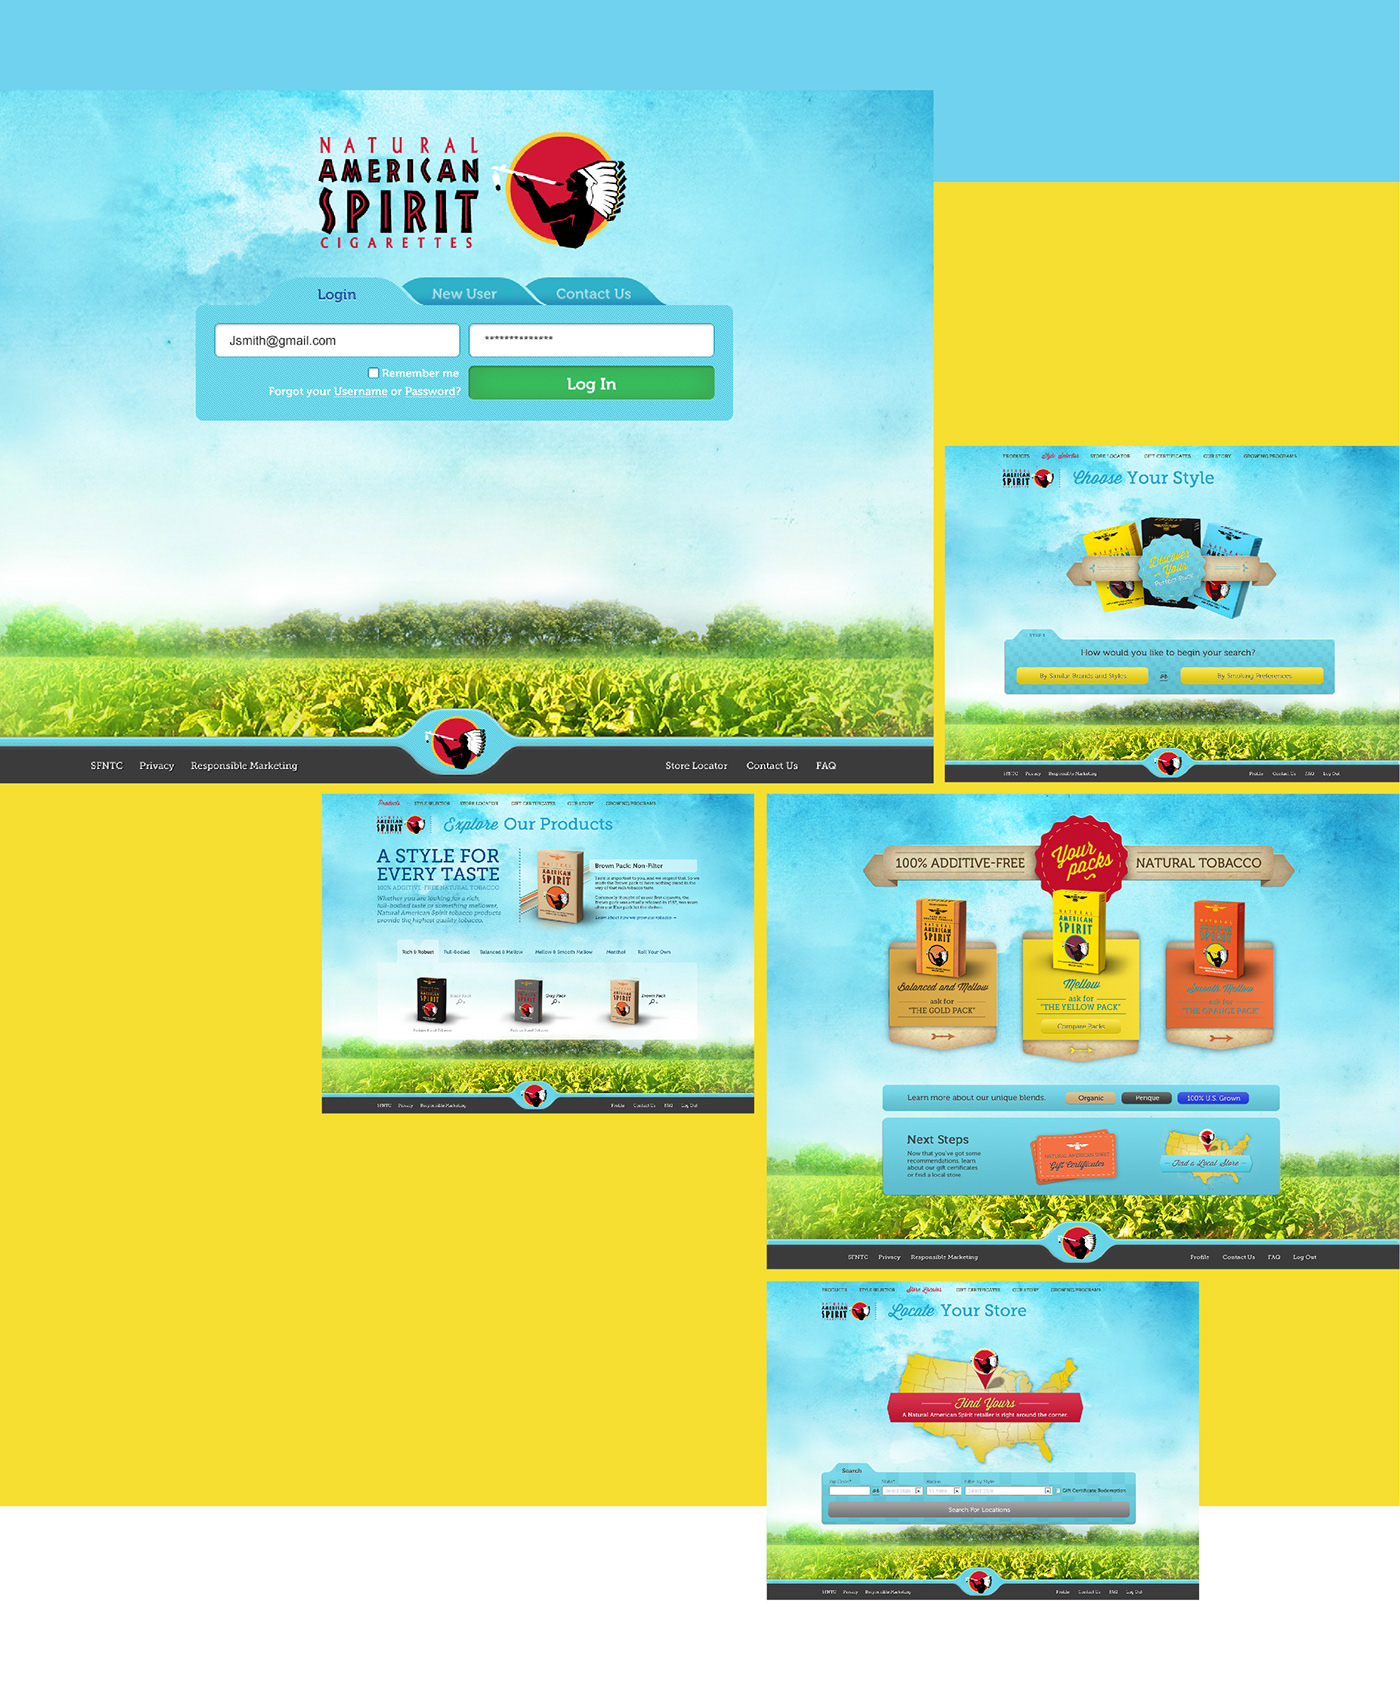 NAS Cigs natural american spirit cigarettes interactive Web tobacco